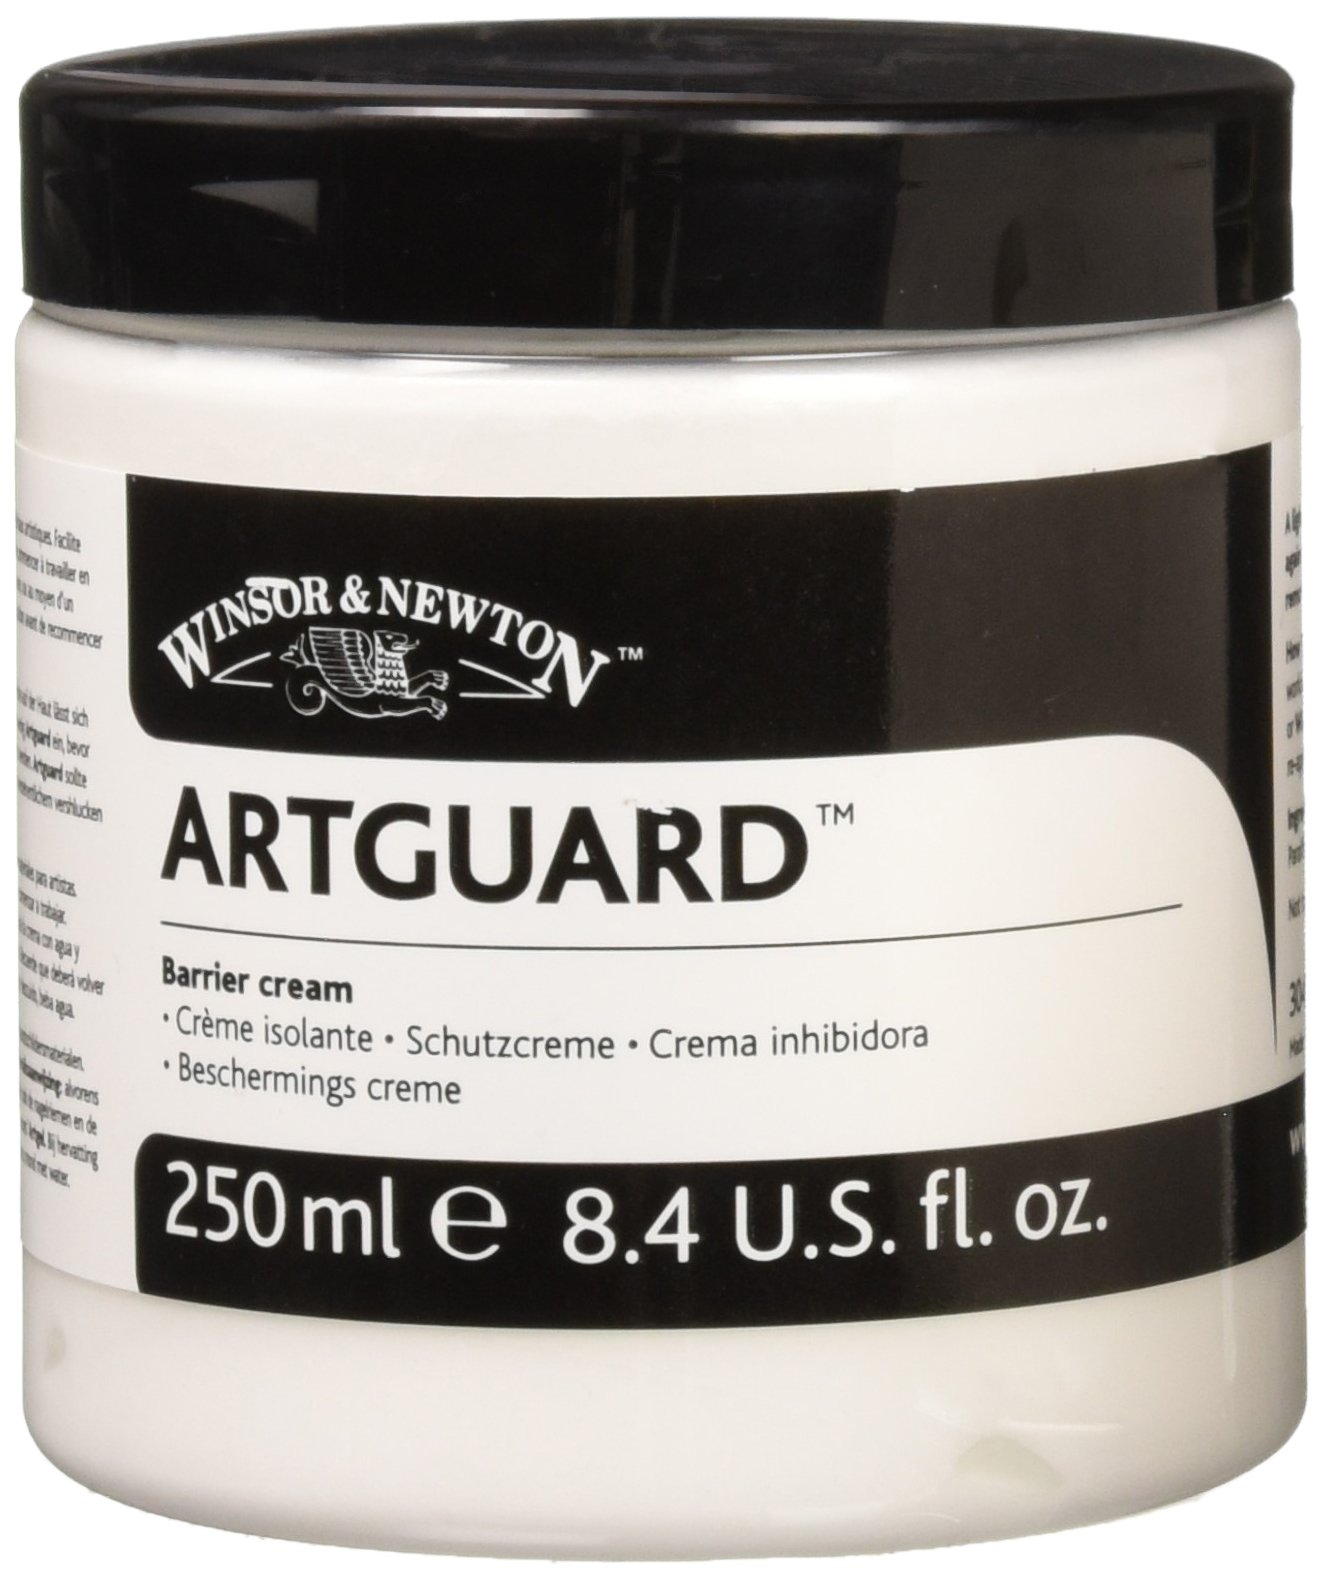 Winsor & Newton Artguard Barrier Cream, 250ml